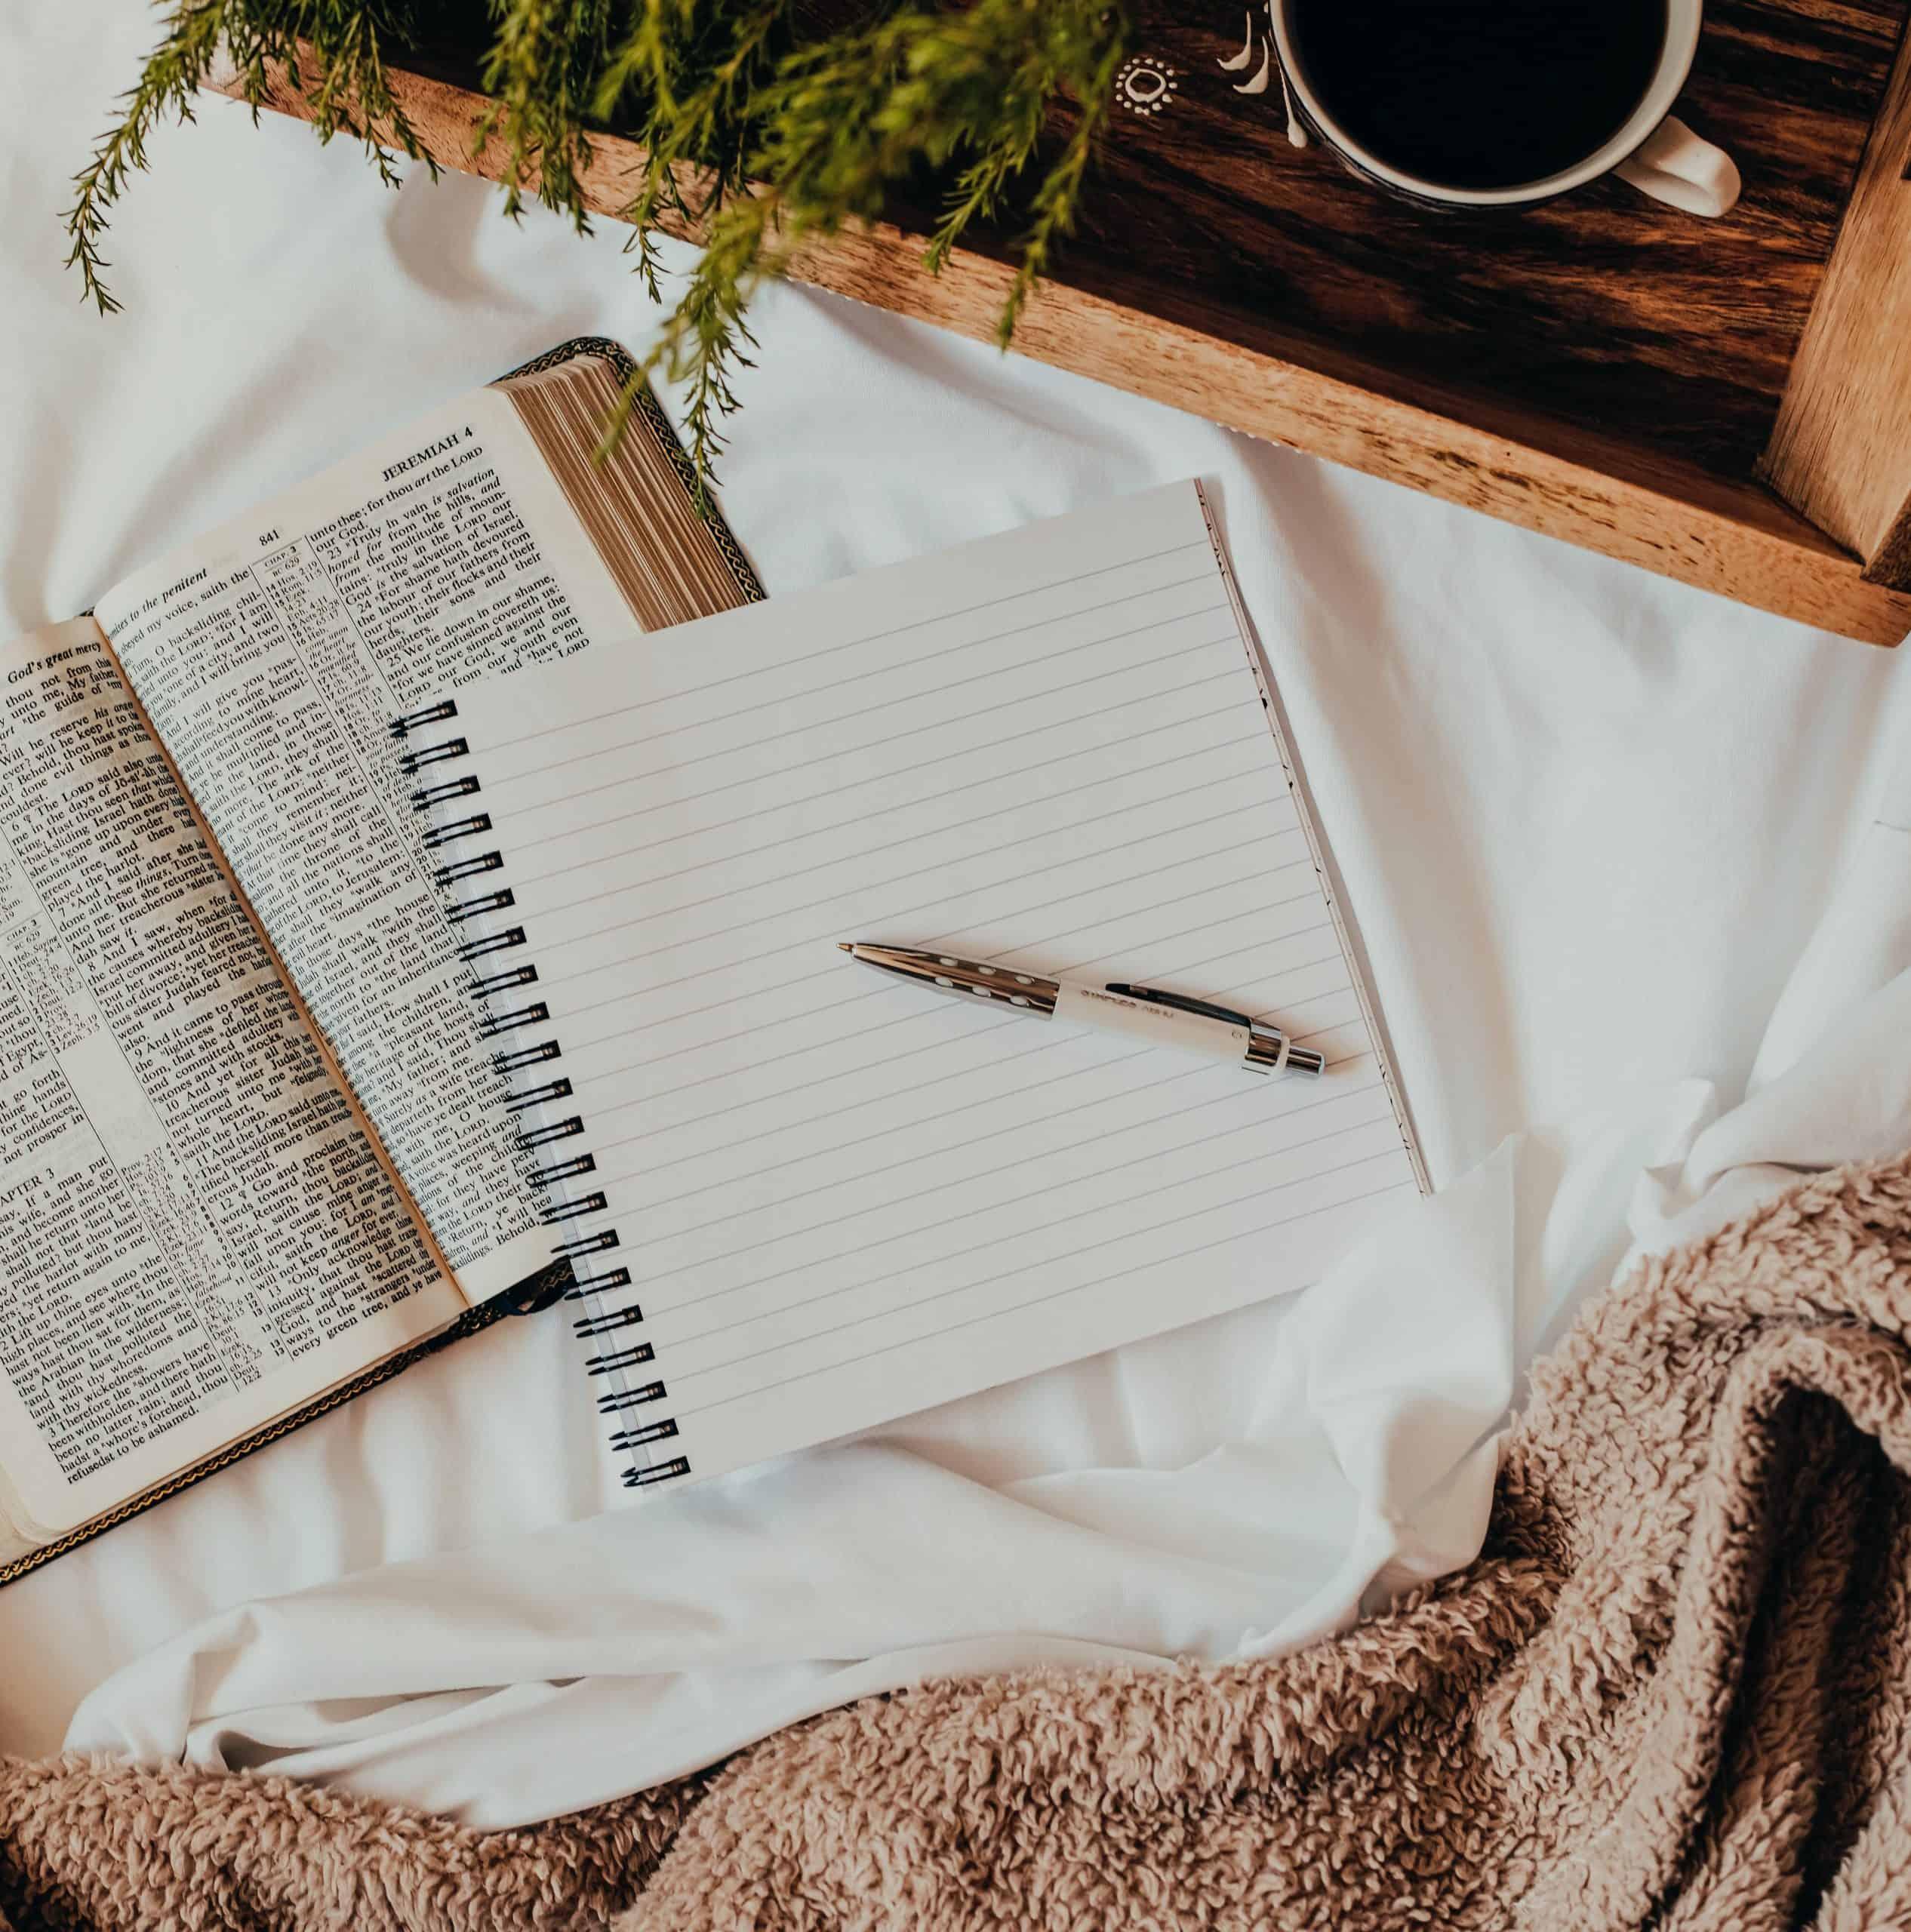 Why Use a Spiritual Journal?